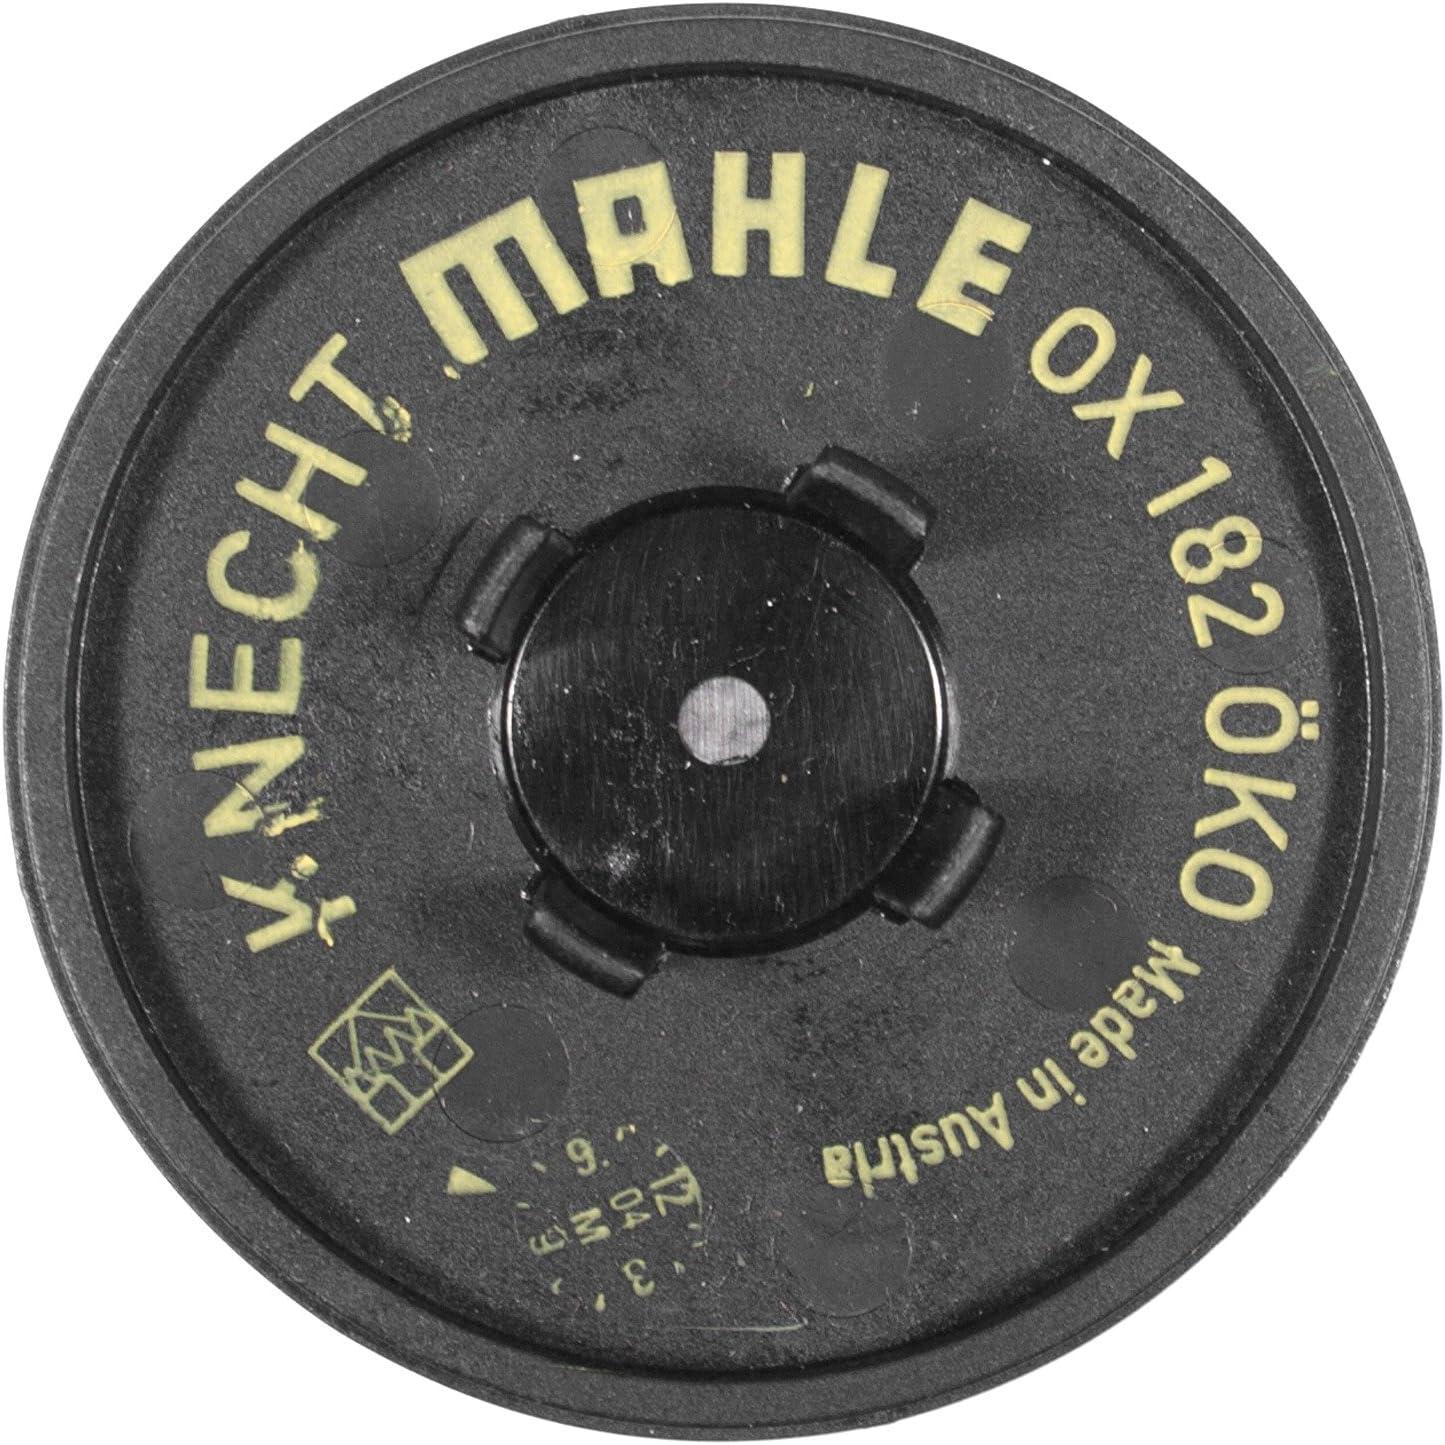 Mahle Knecht Ox 182d Öllfilter Auto